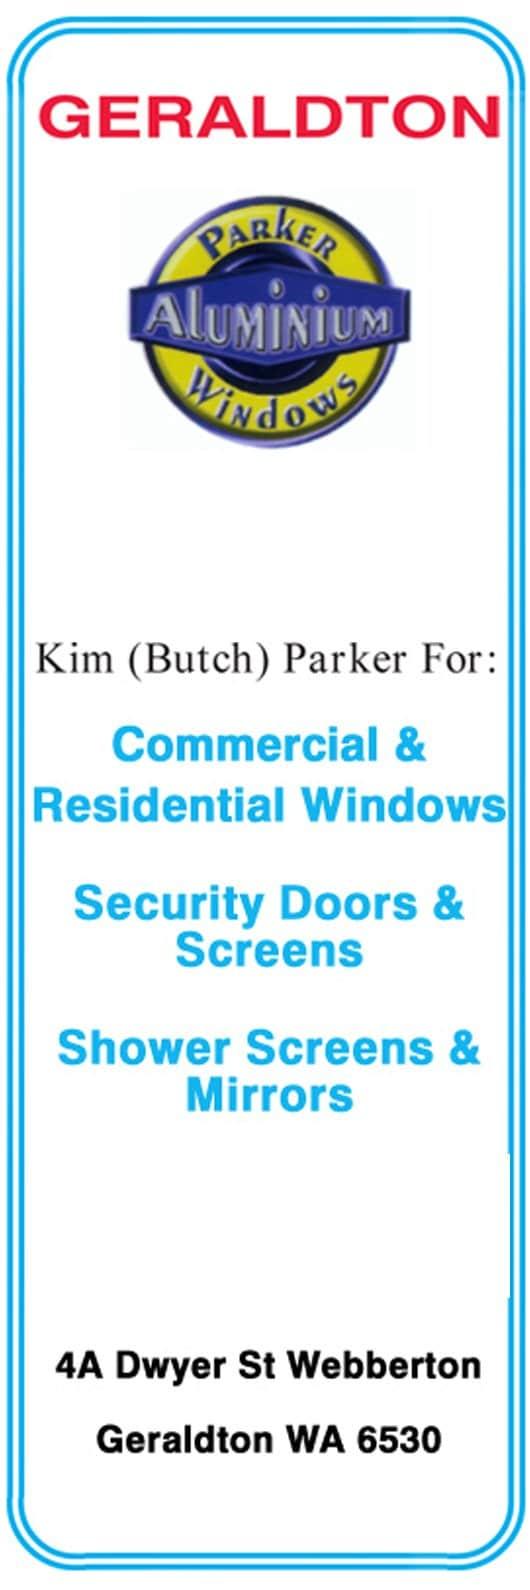 Residential windows commercial windows marine windows products - Parker Aluminium Windows Promotion